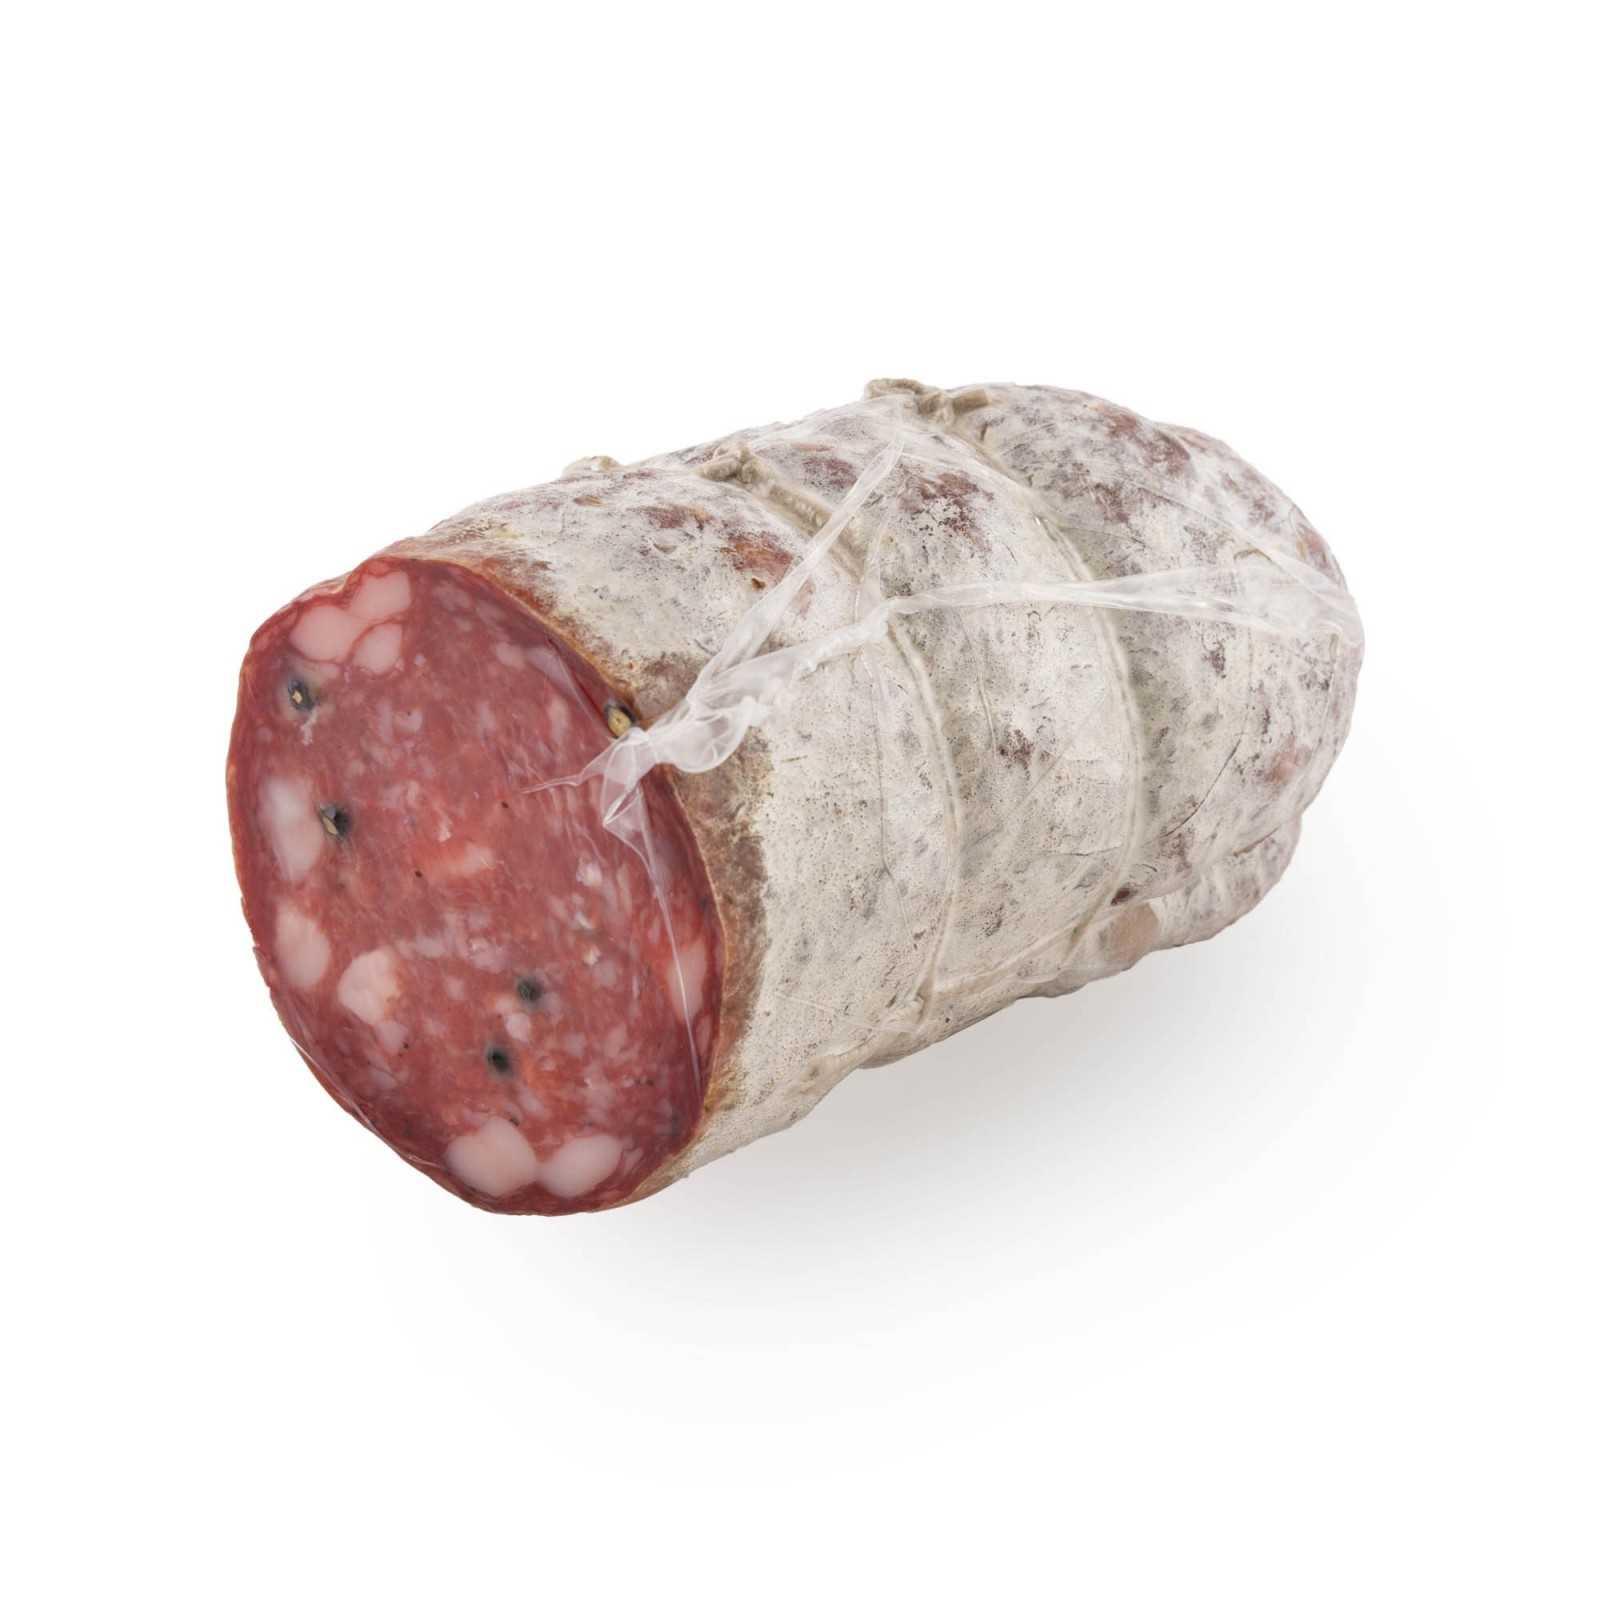 Tuscan Salami - Vacuum-Packed Piece.